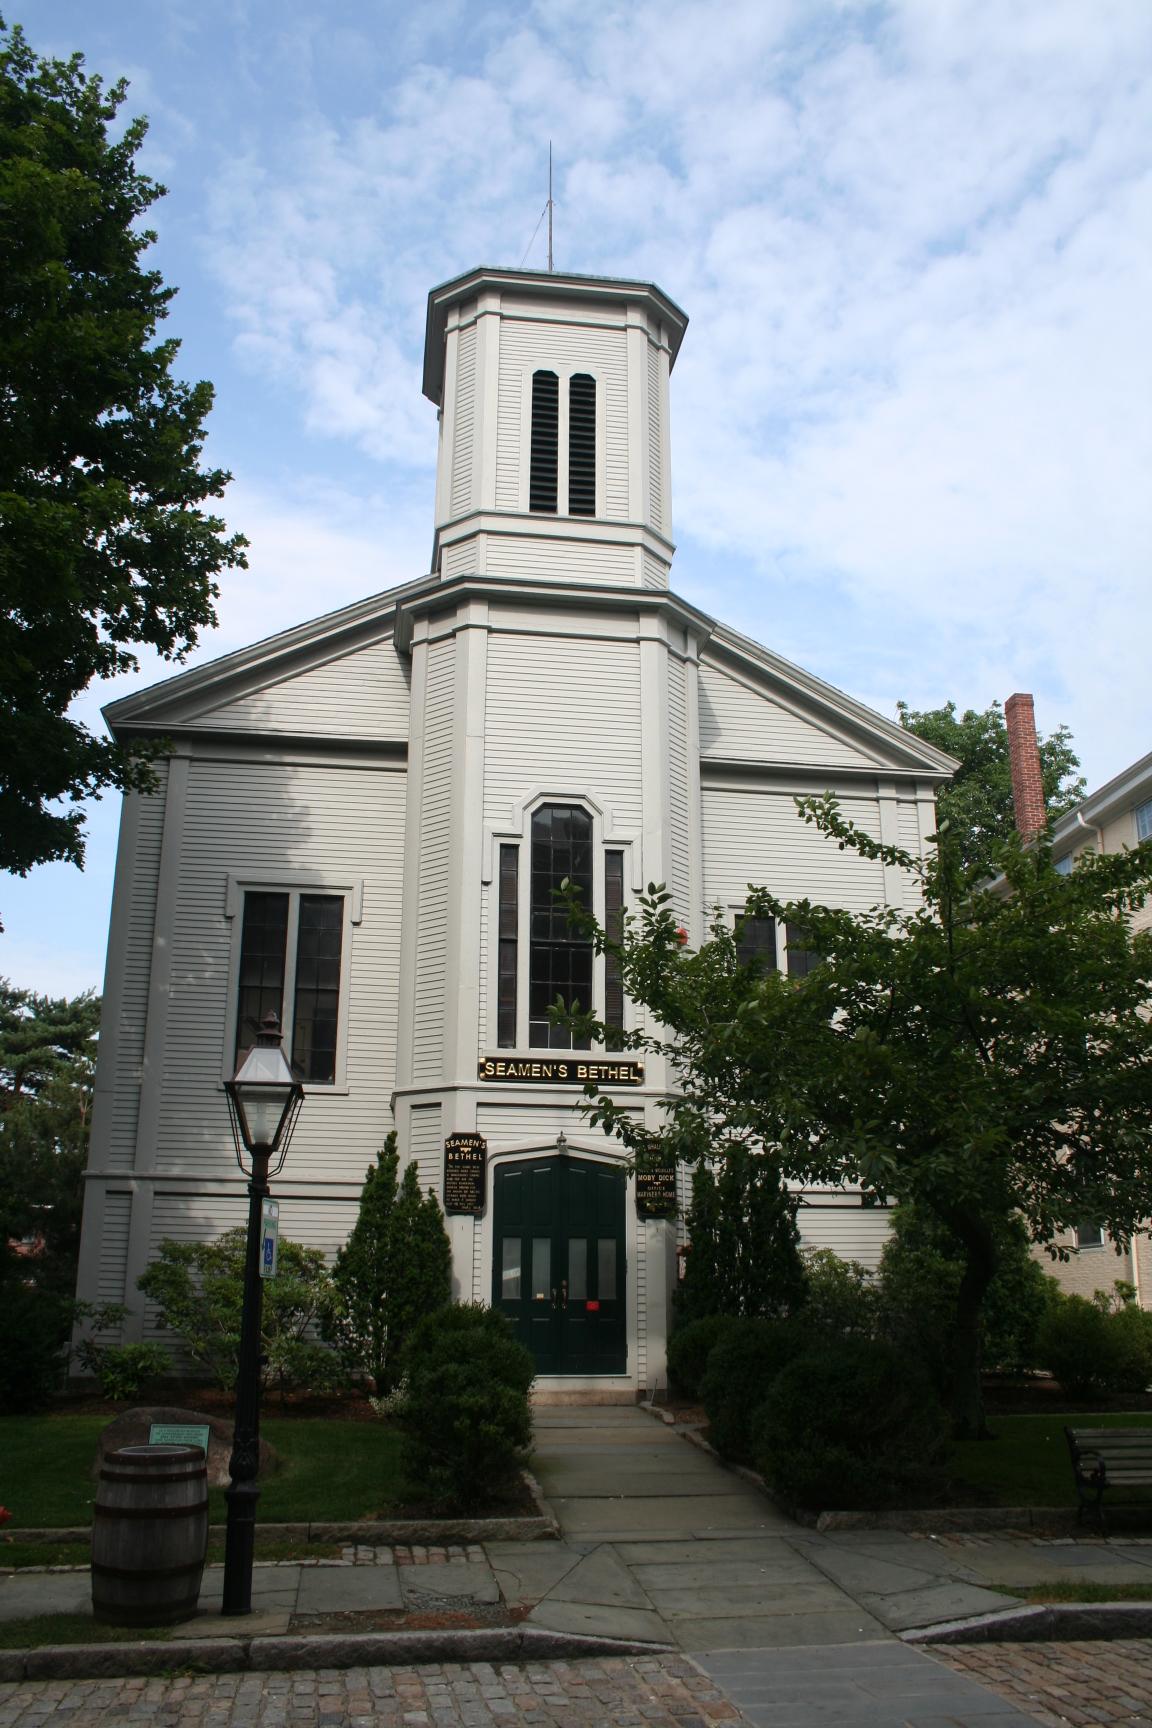 Seamen's Bethel - Wikipedia